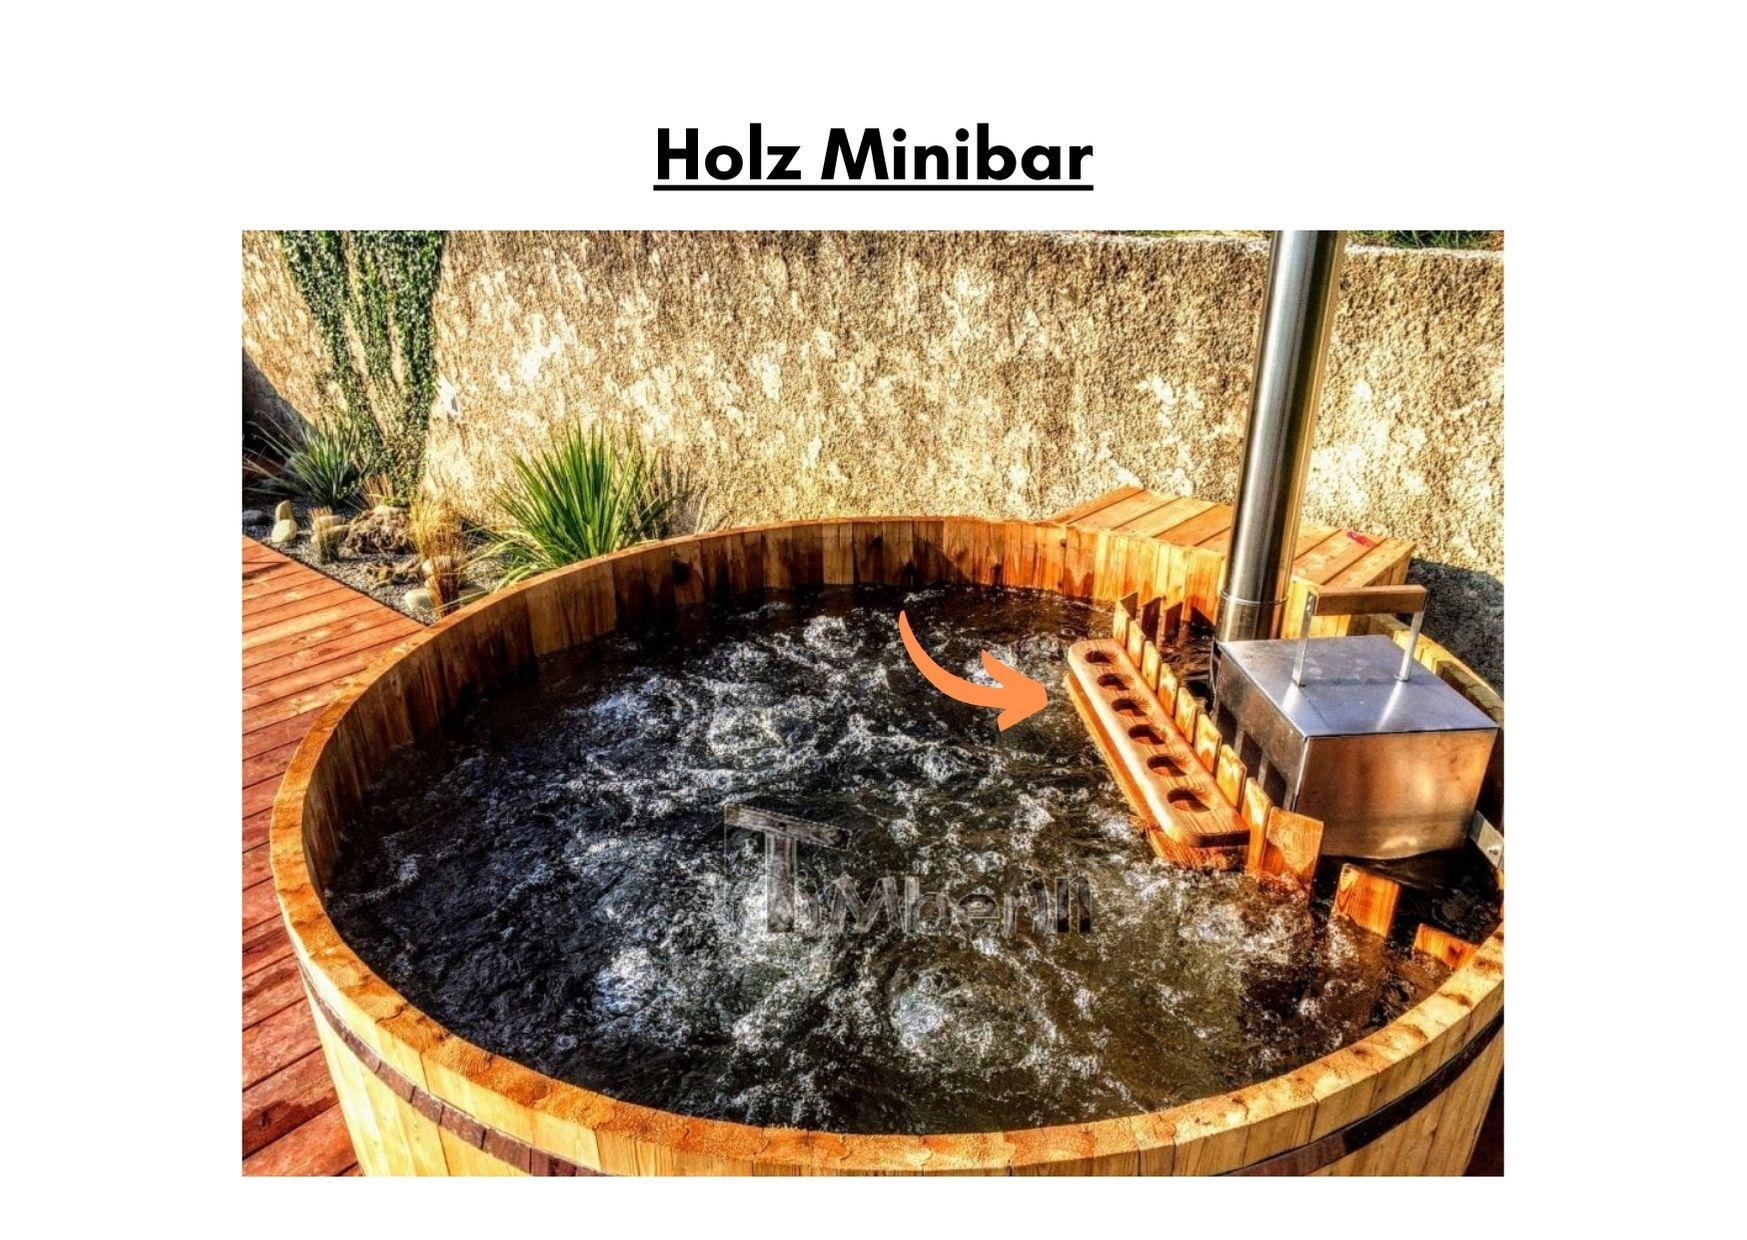 Holz Minibar